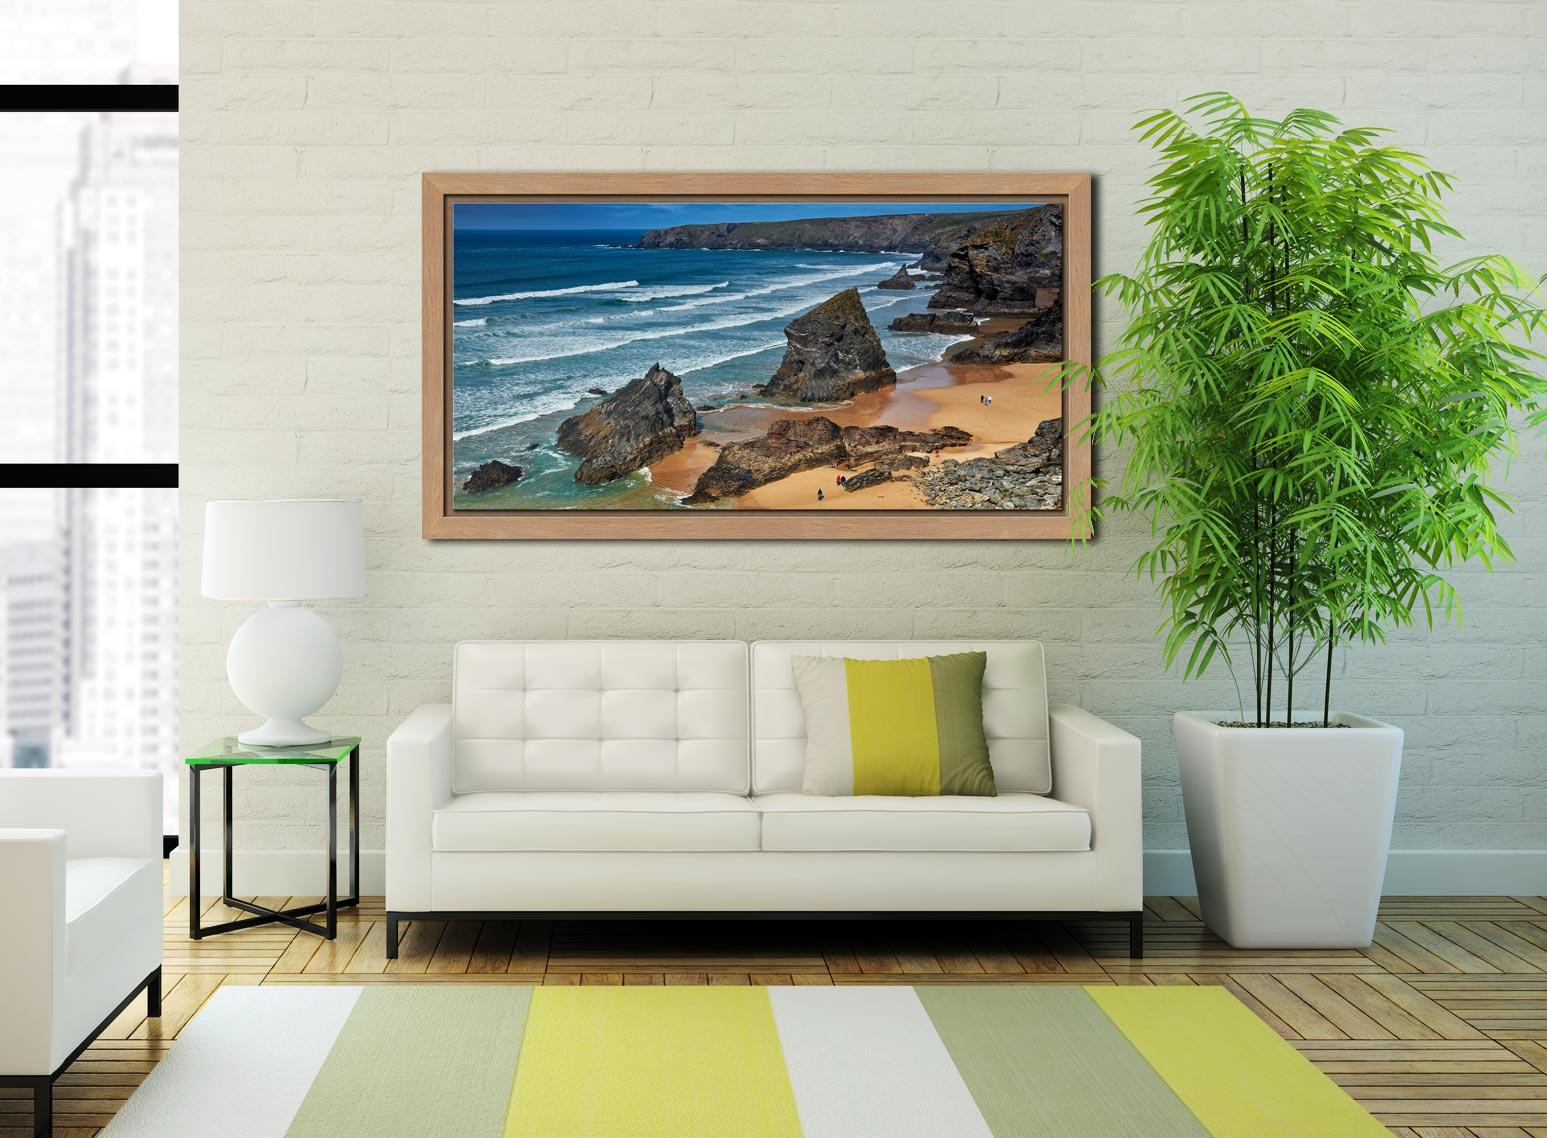 Bedruthan Steps Beach Rocks - Oak floater frame with acrylic glazing on Wall